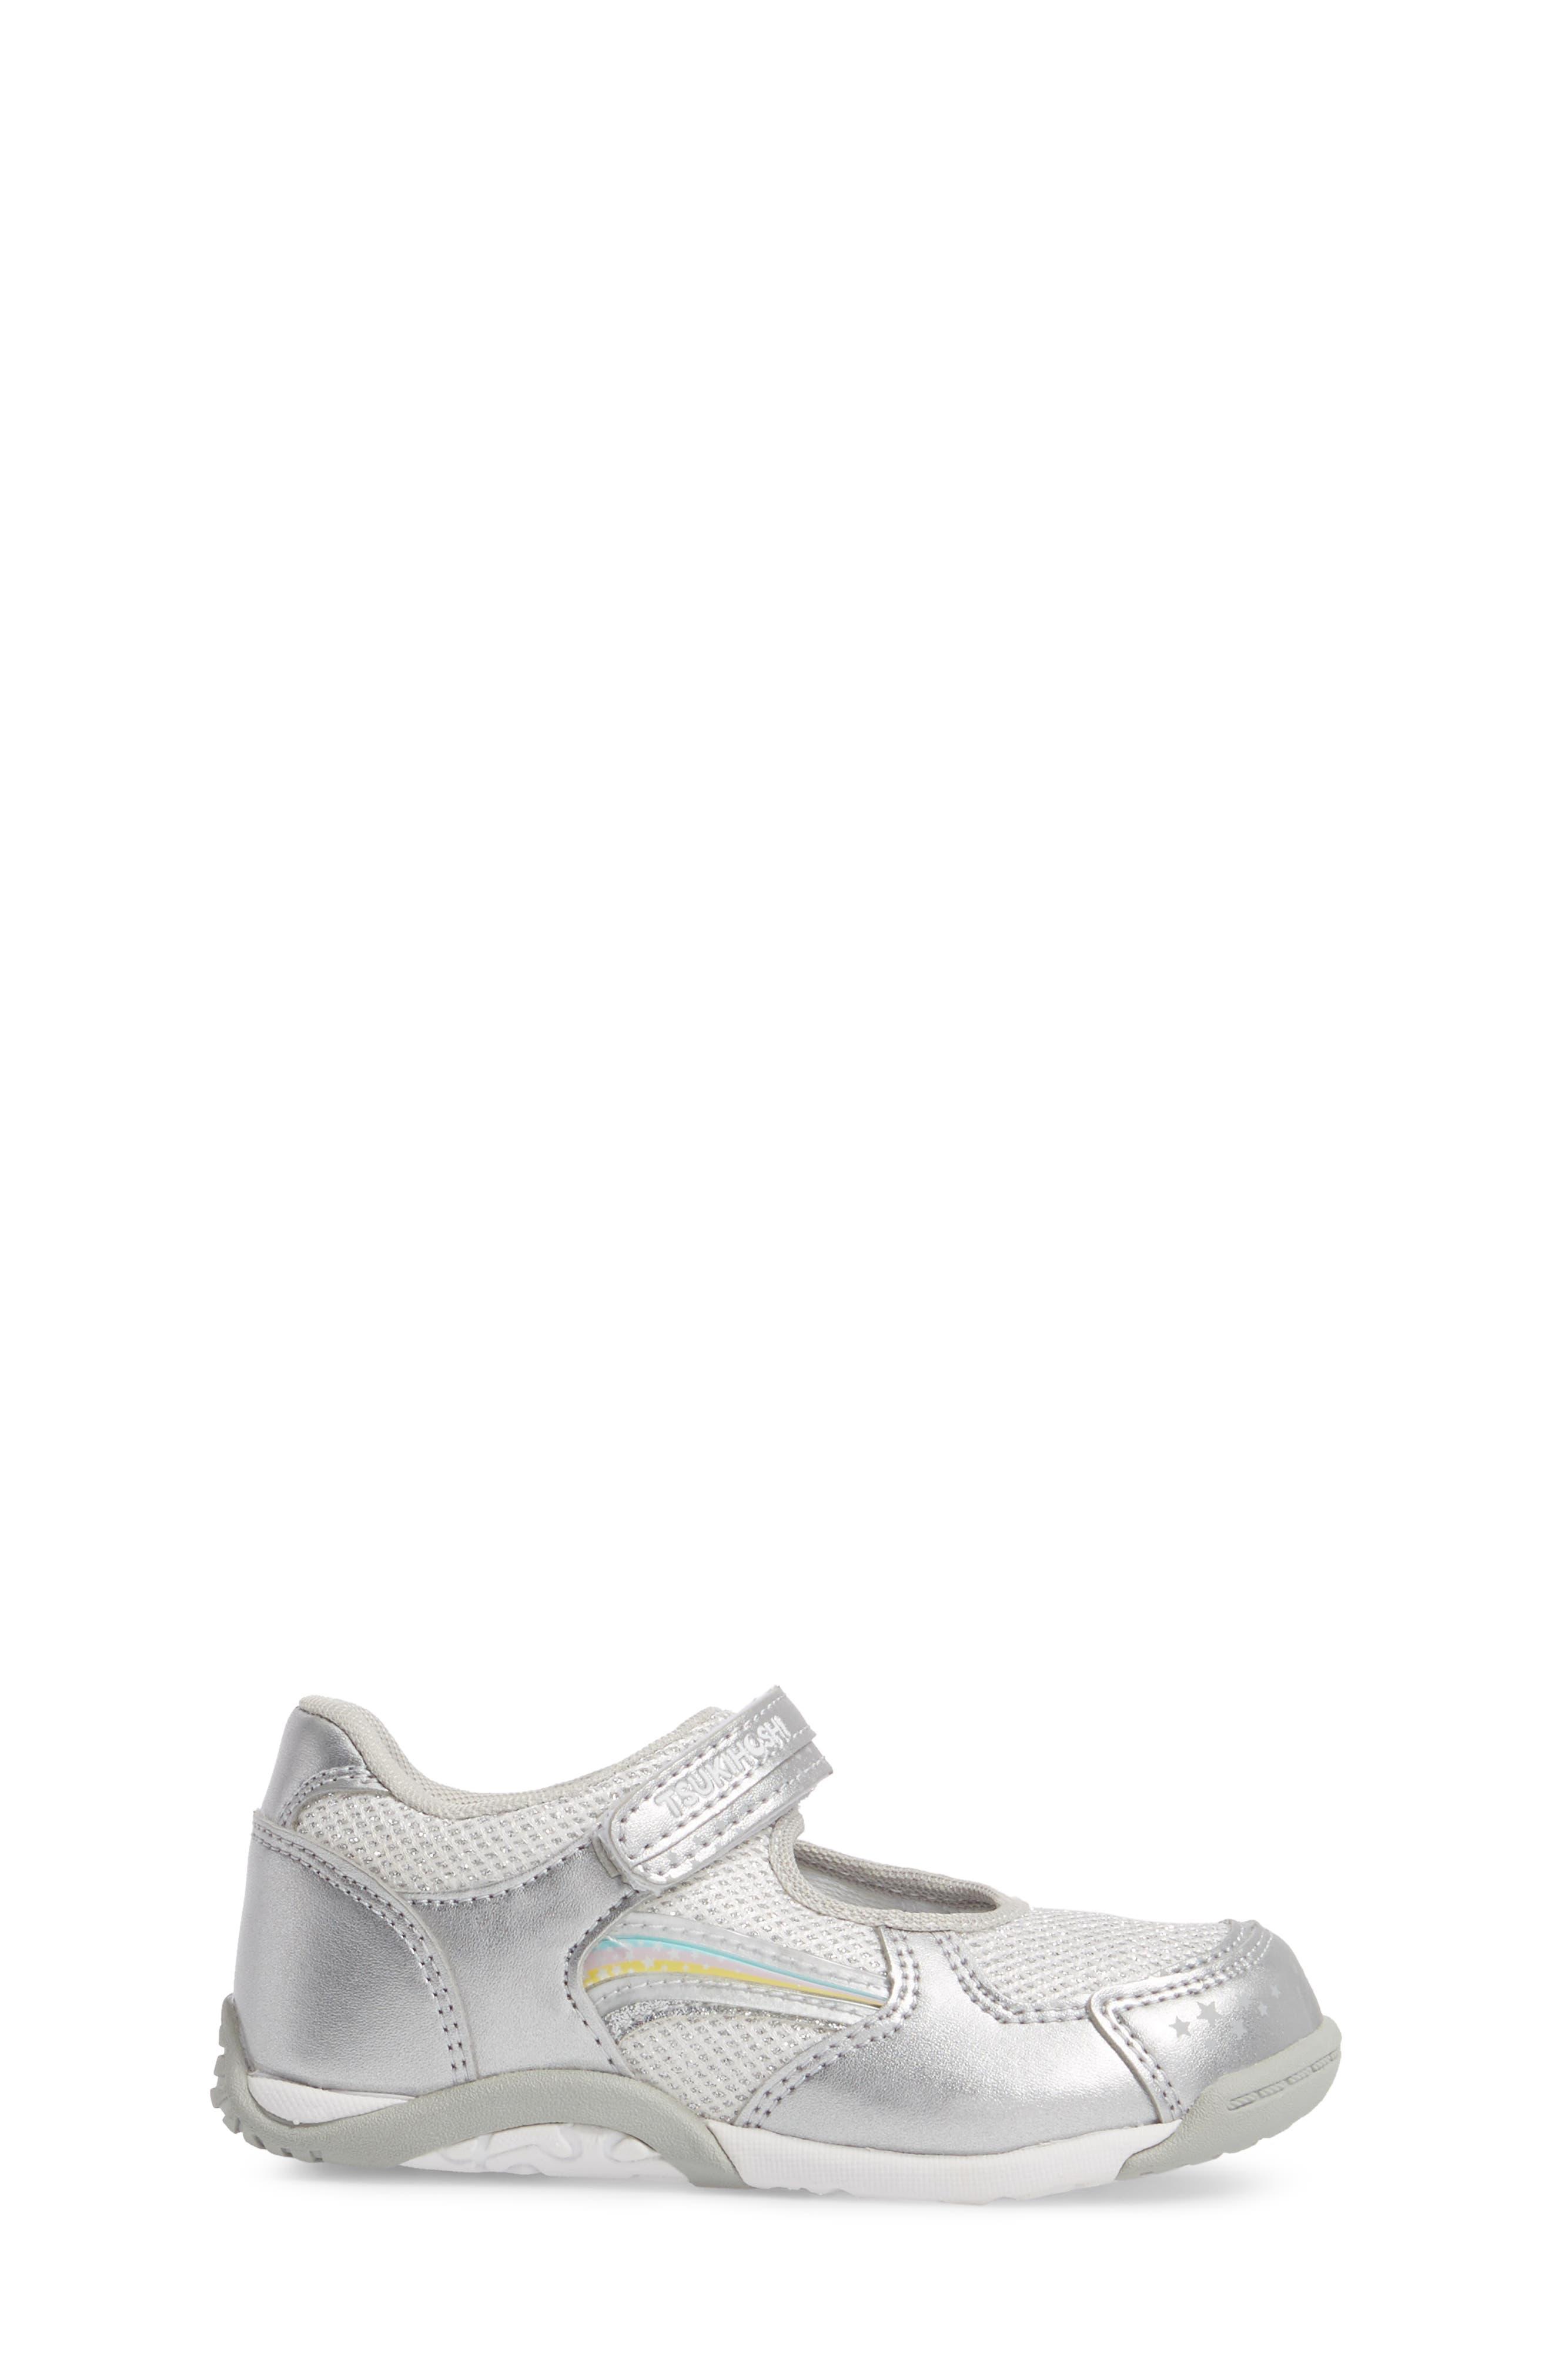 TSUKIHOSHI, Twinkle Washable Sneaker, Alternate thumbnail 3, color, SILVER/ SILVER